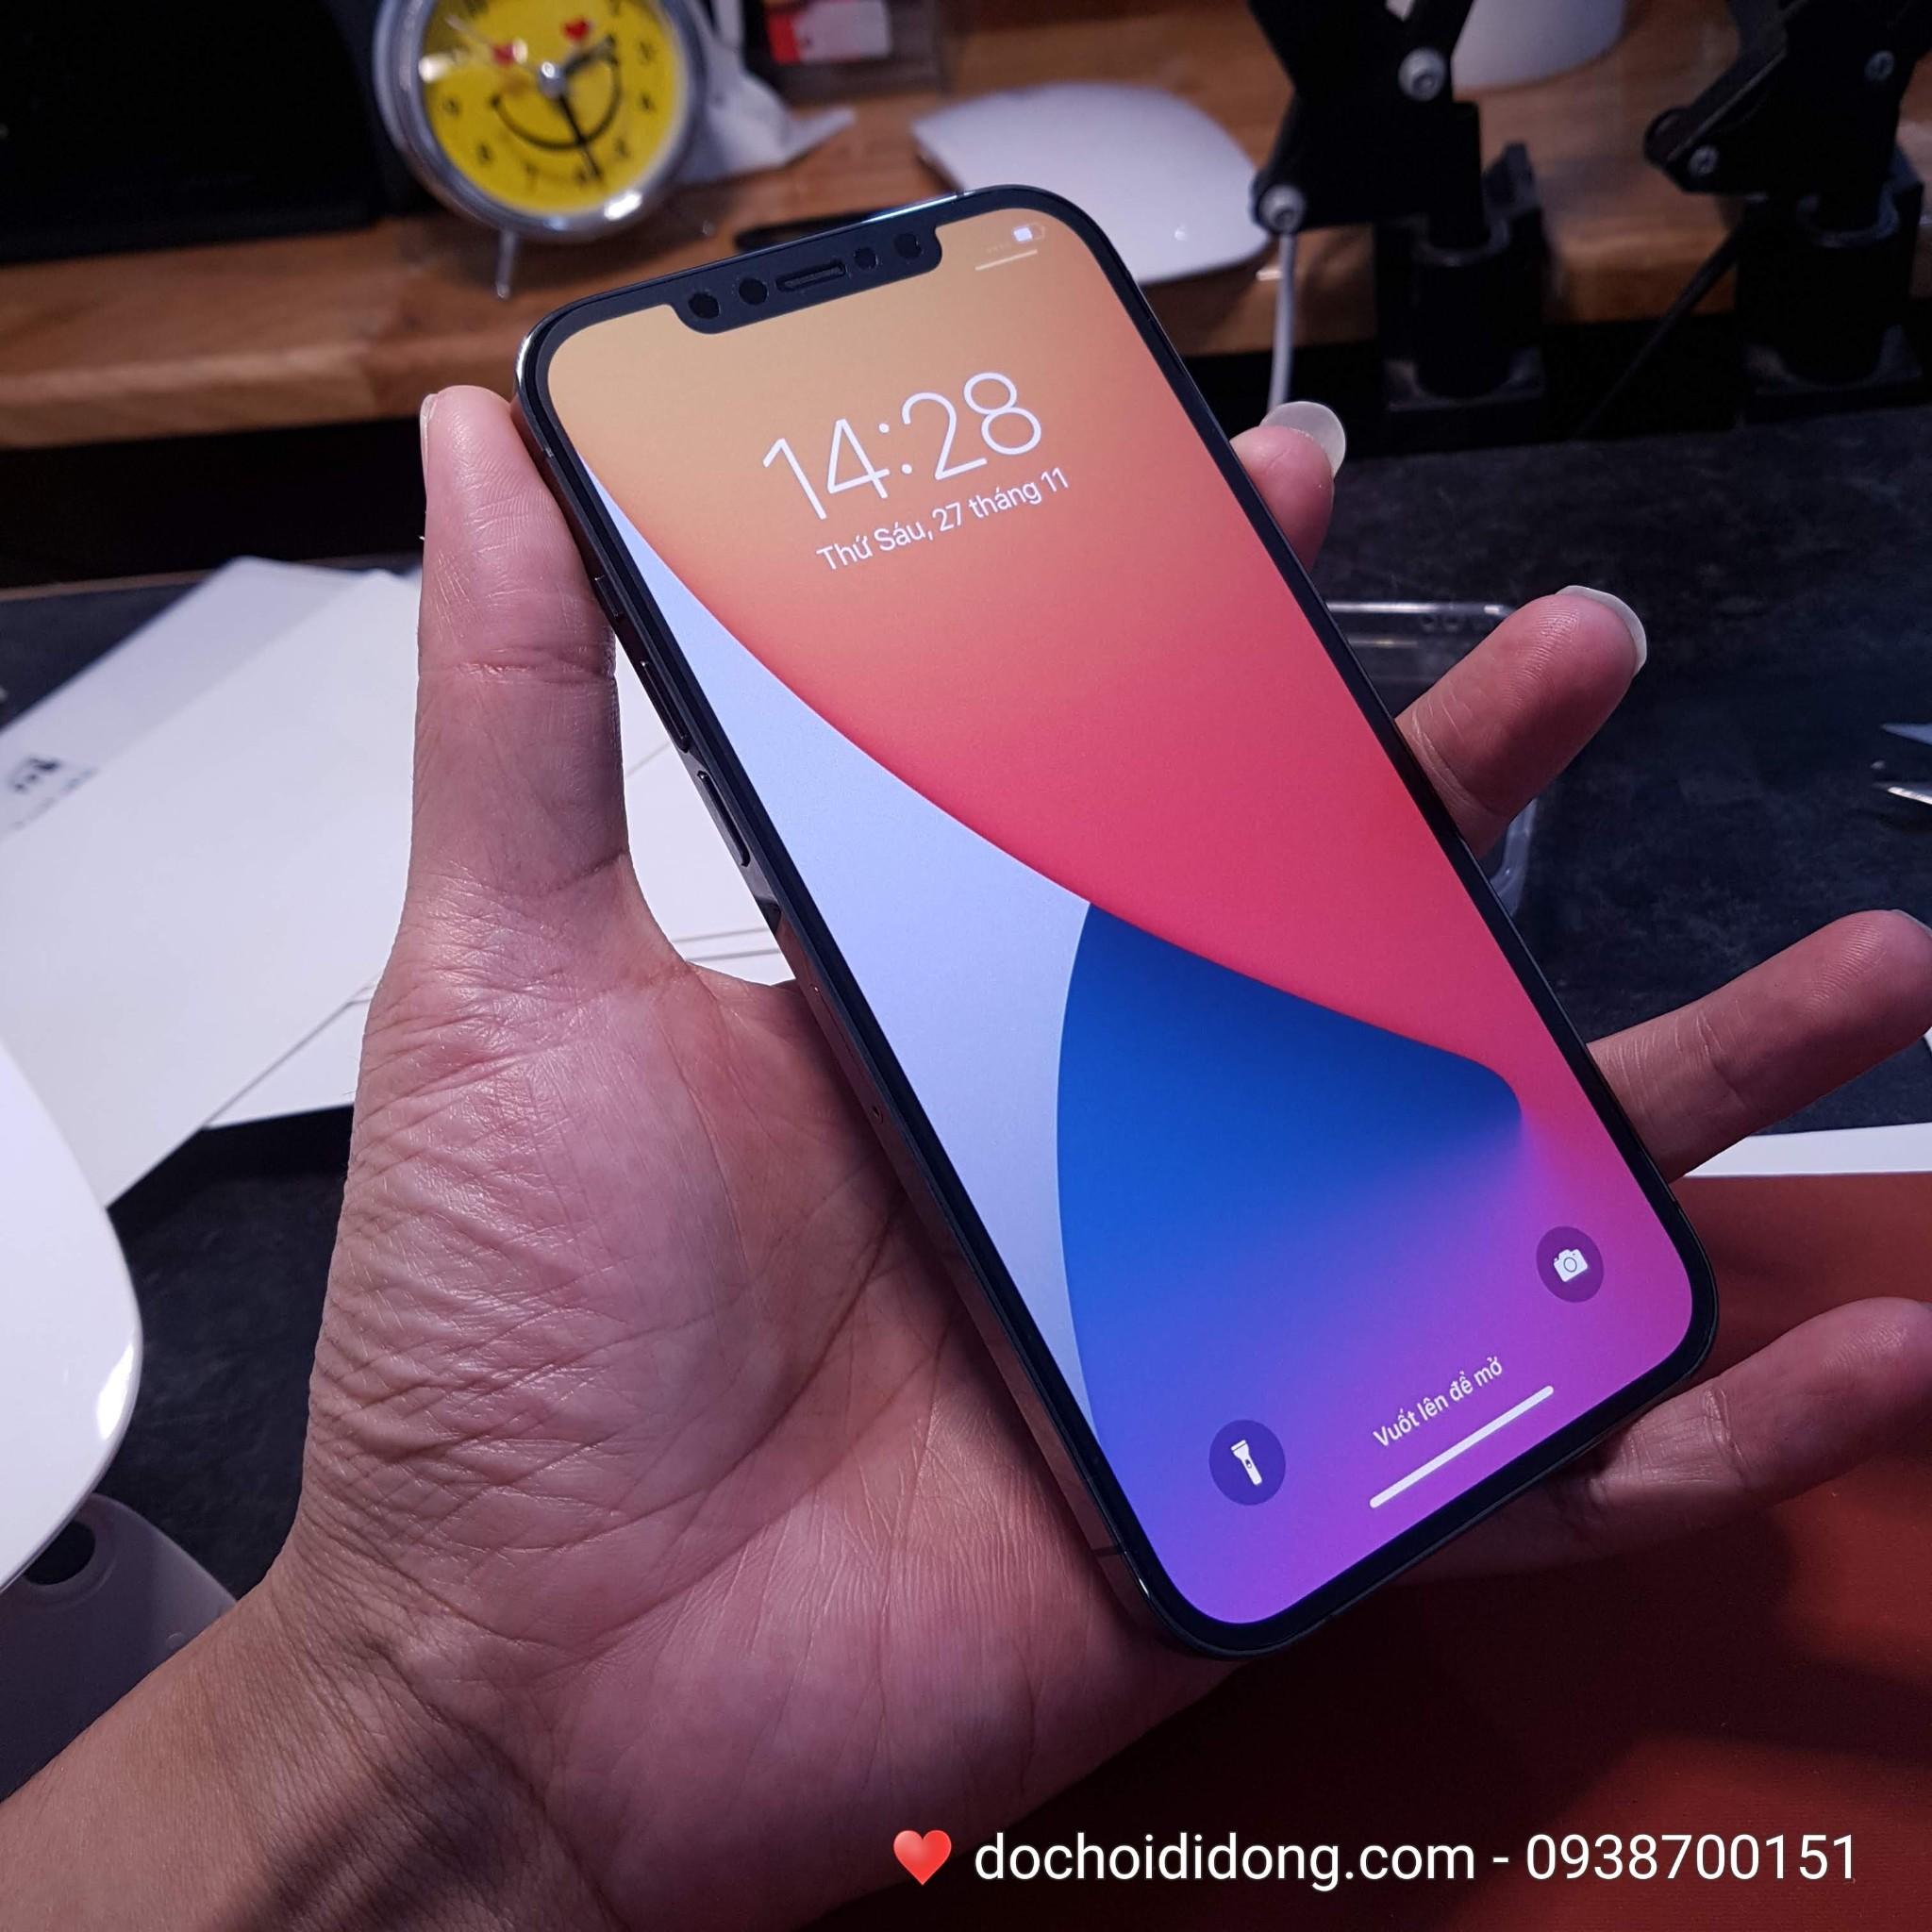 mieng-dan-ppf-rock-iphone-12-pro-max-trong-nham-doi-mau-cao-cap